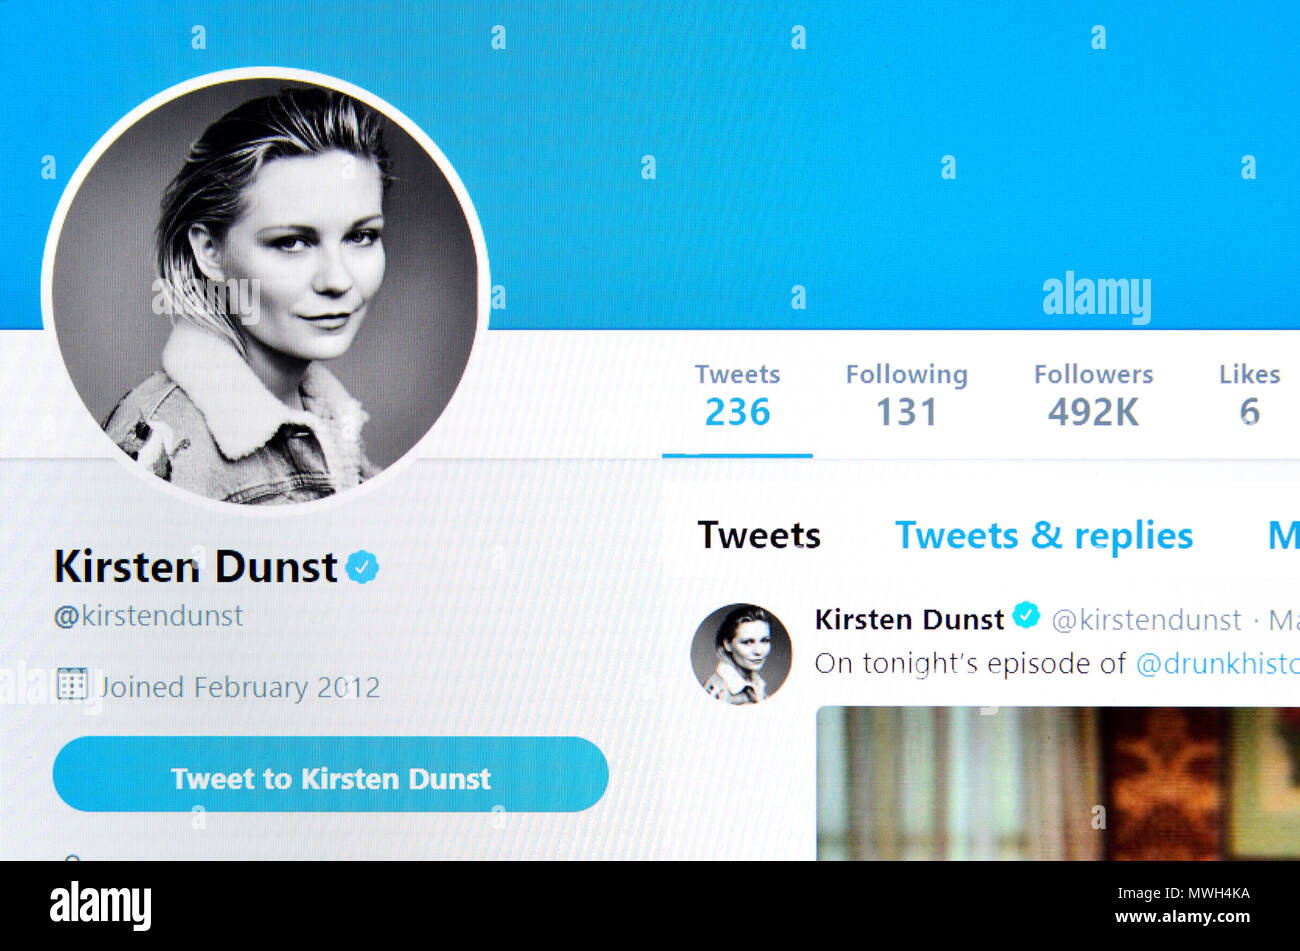 Kirsten Dunst Twitter page (2018) - Stock Image